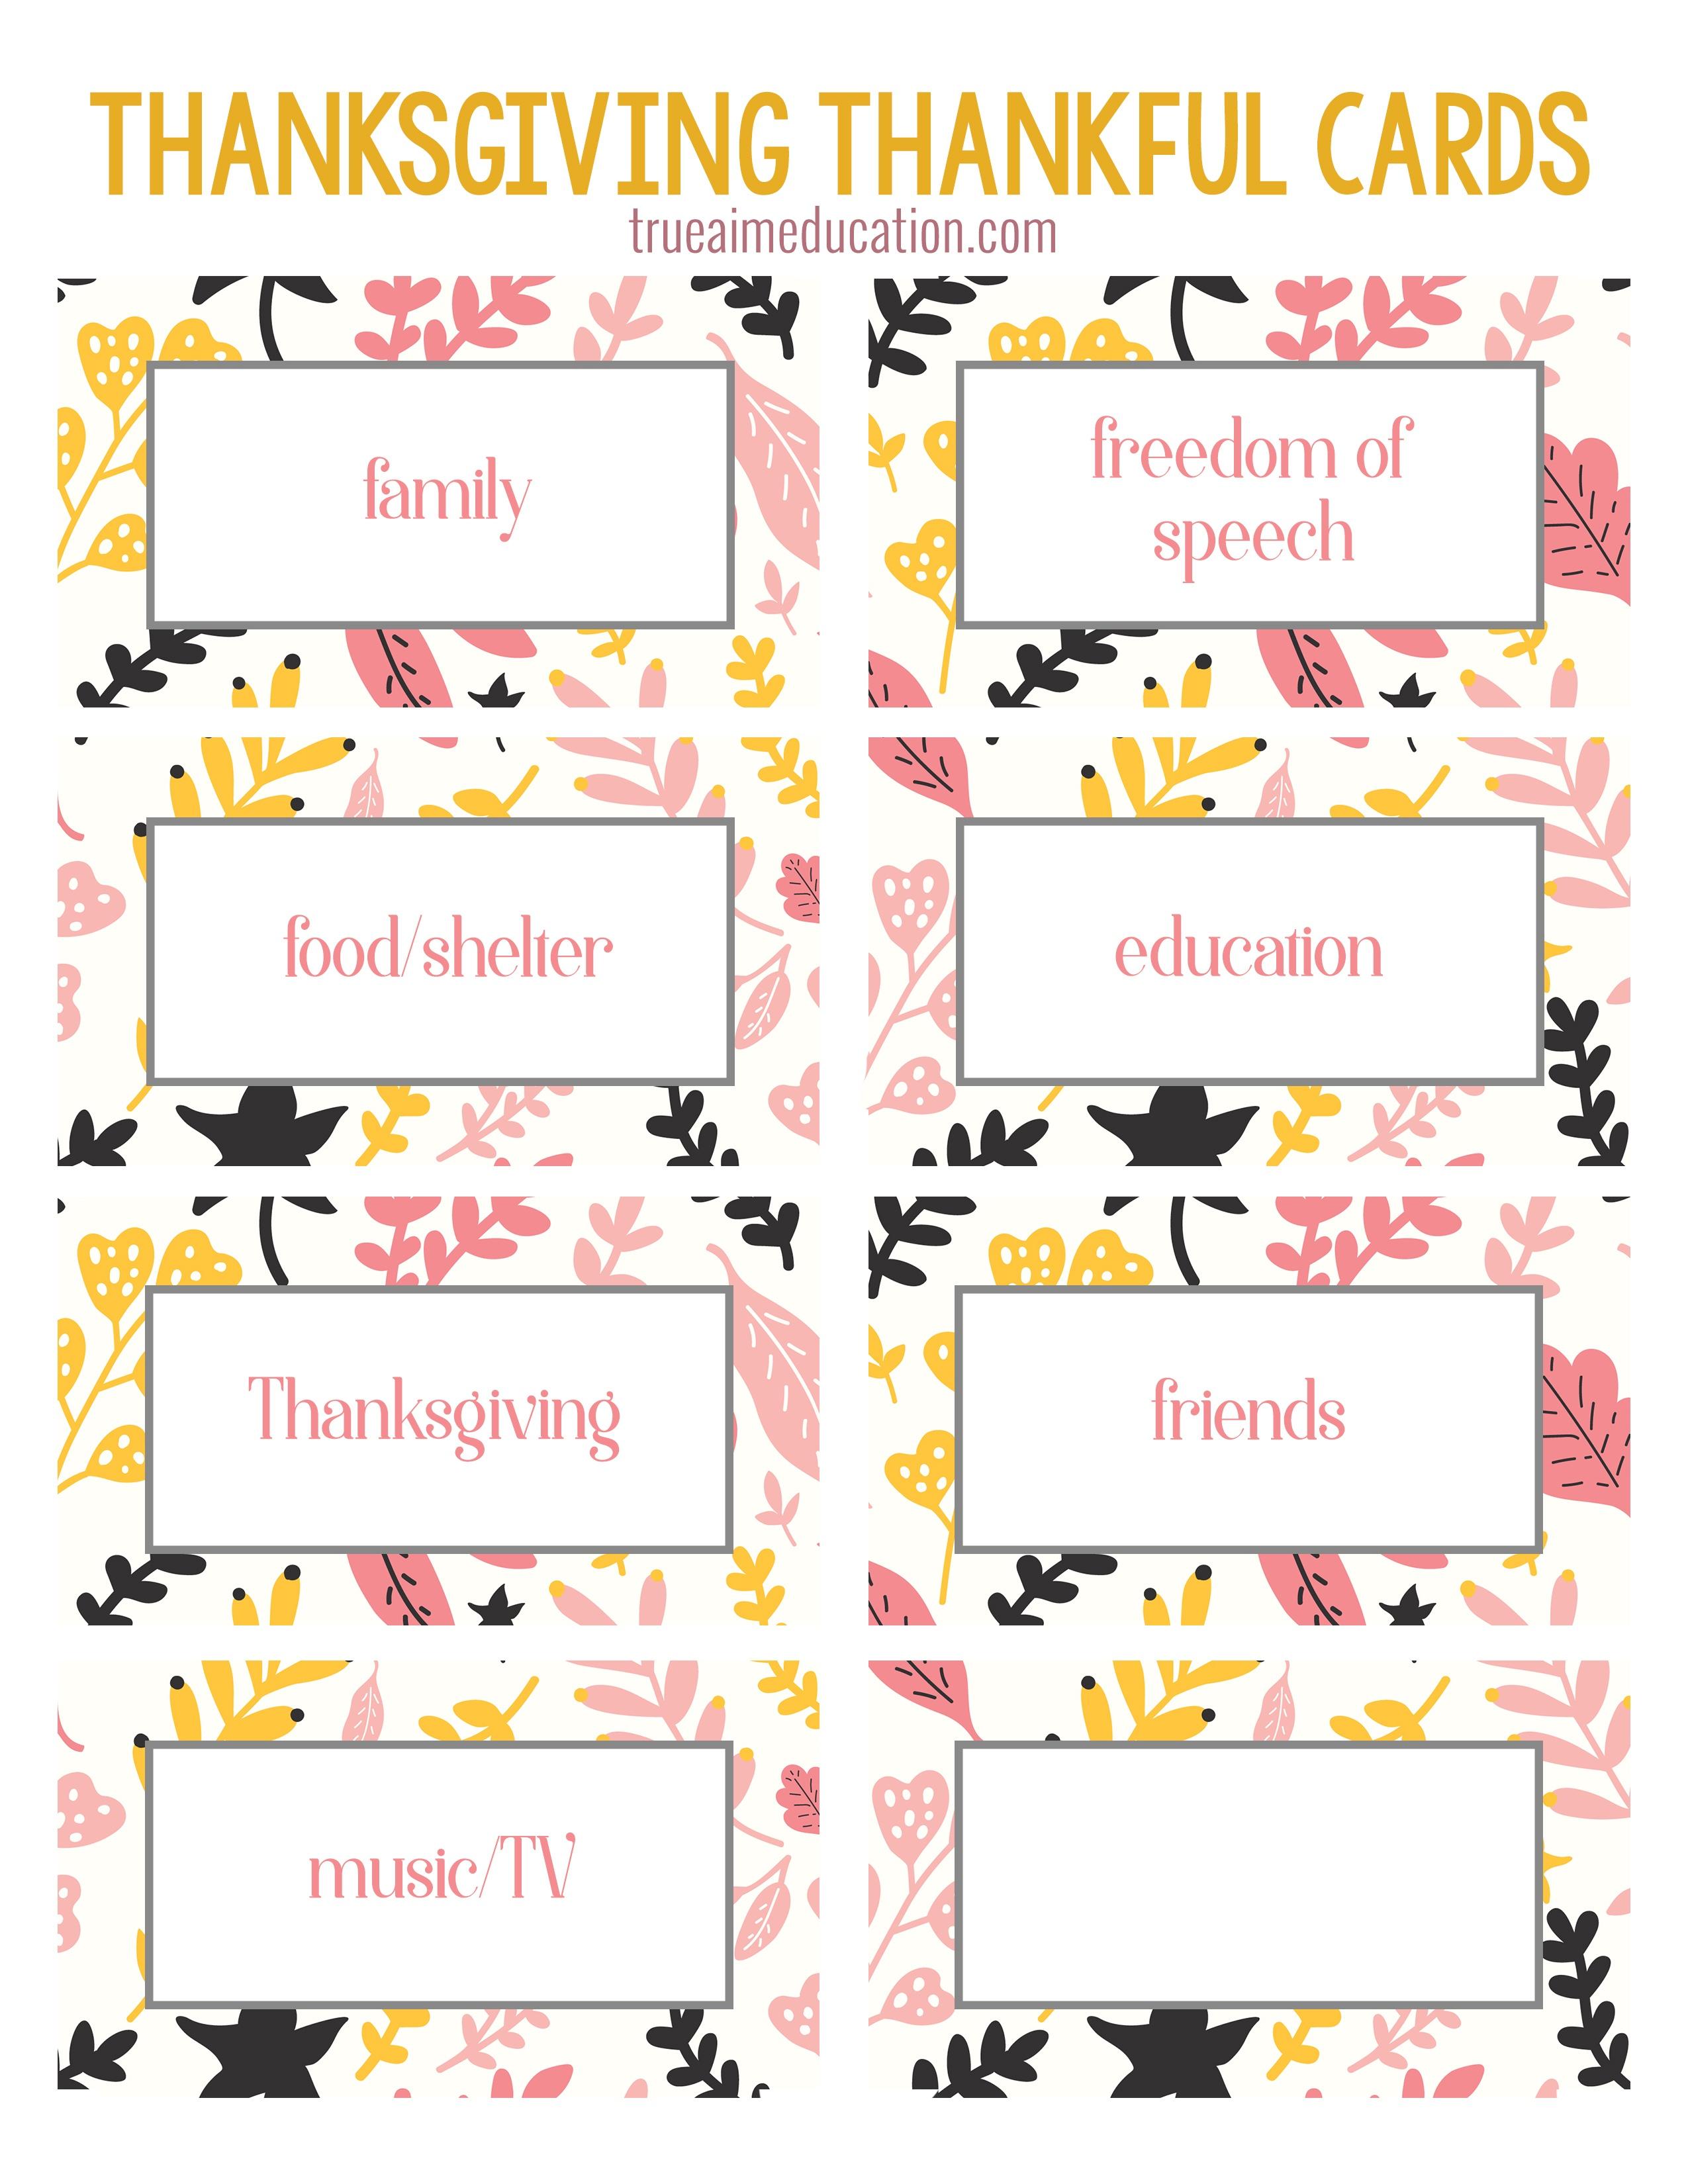 Thanksgiving Thankfulness With Free Printable Cards - Free Printable Thanksgiving Cards